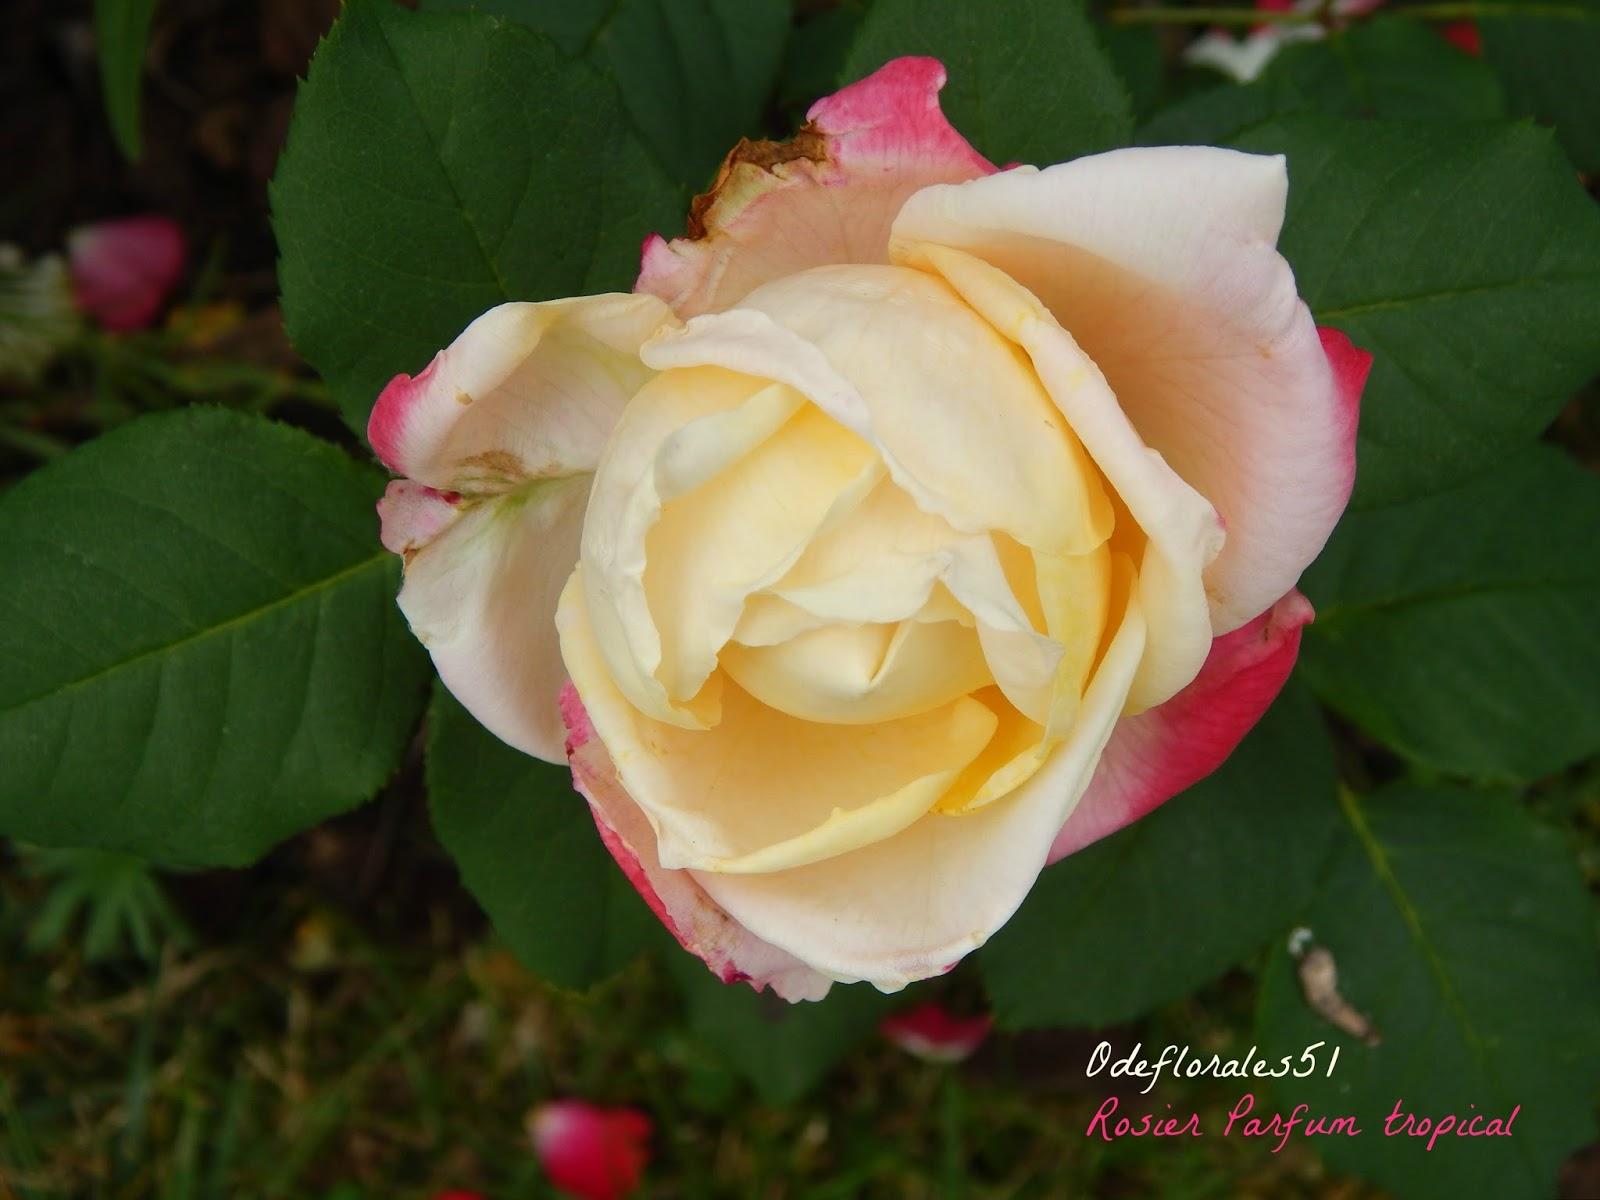 beaut s florales rosier parfum tropical. Black Bedroom Furniture Sets. Home Design Ideas